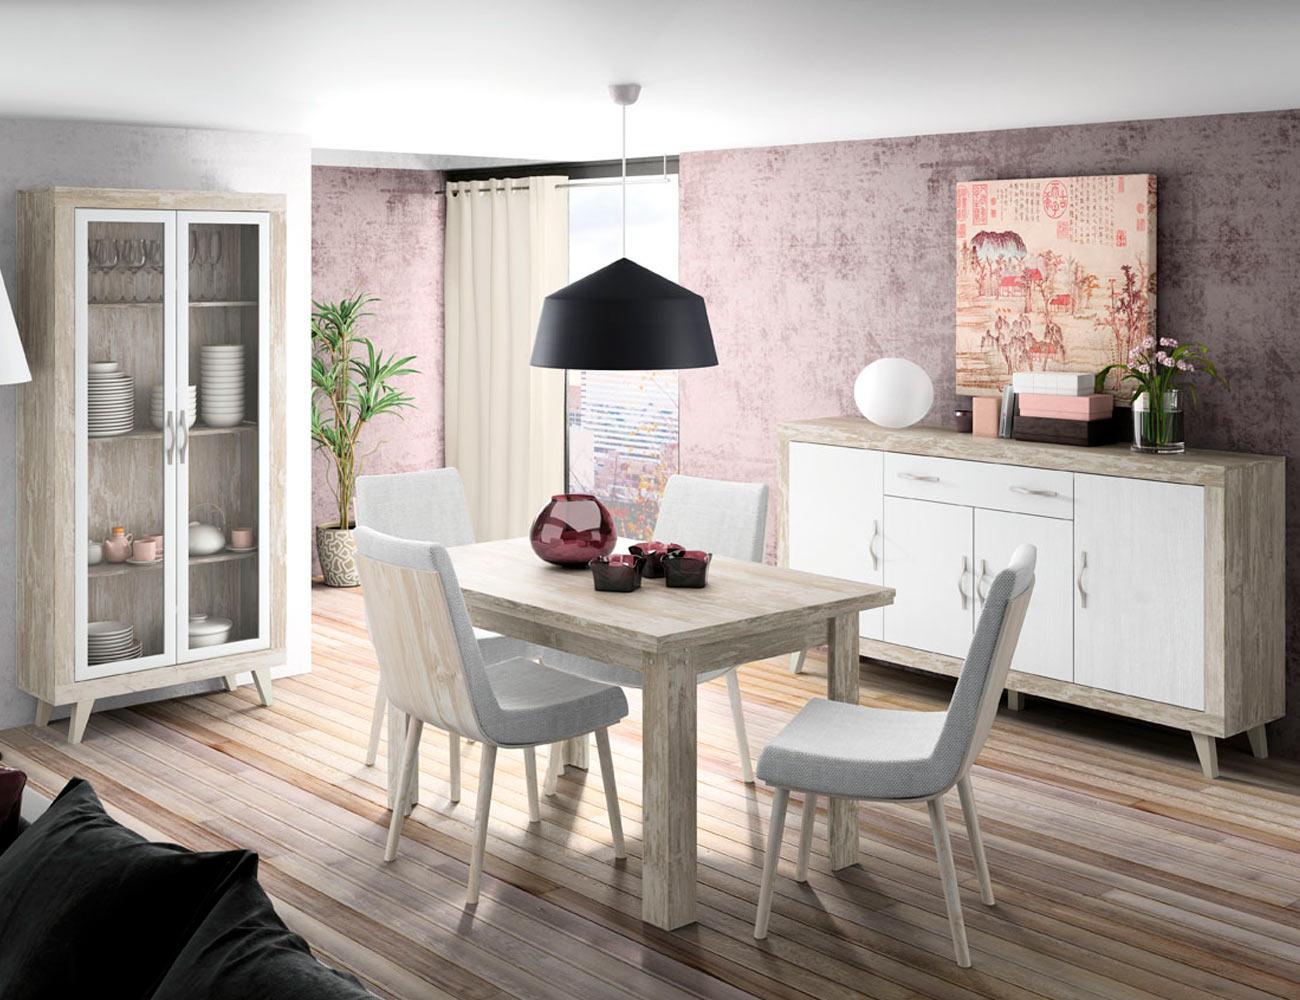 166 mueble salon comedor vitrina aparador mesa silla vintage soul blanco